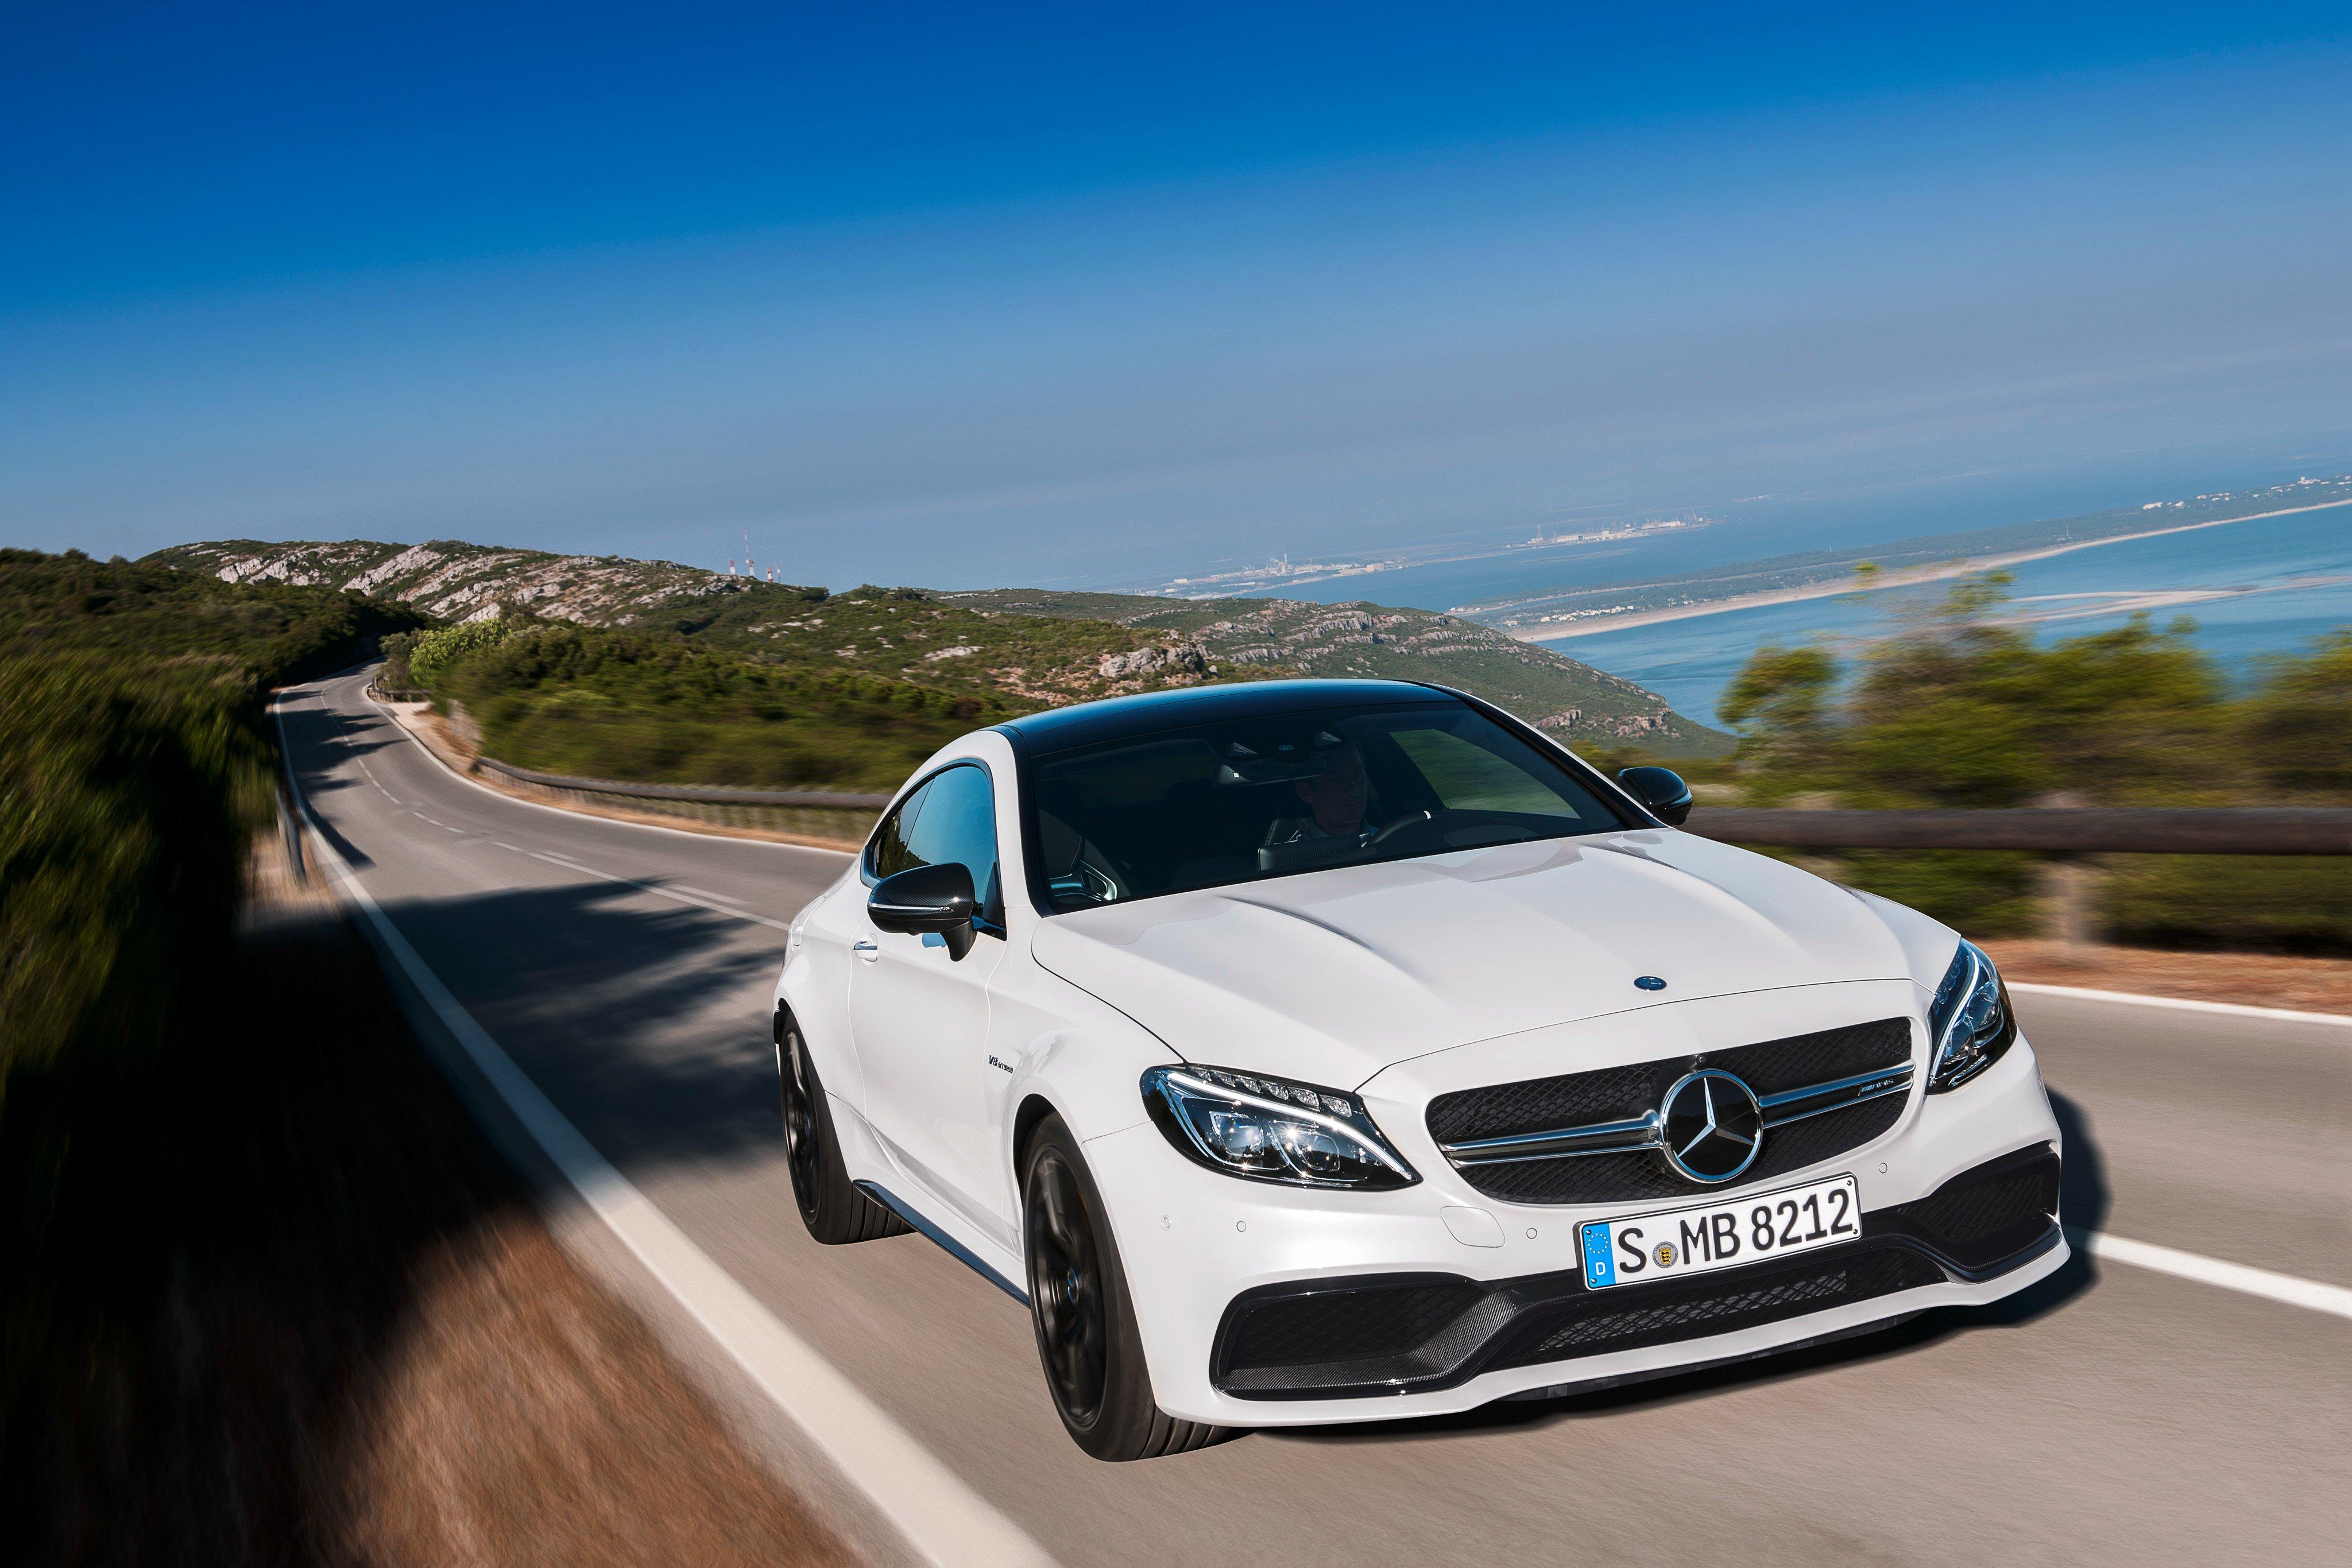 2015 mercedes amg c63 s coupe c205 benz luxury wallpaper 4096x2731 782335 wallpaperup - Mercedes c63 amg coupe 2015 ...